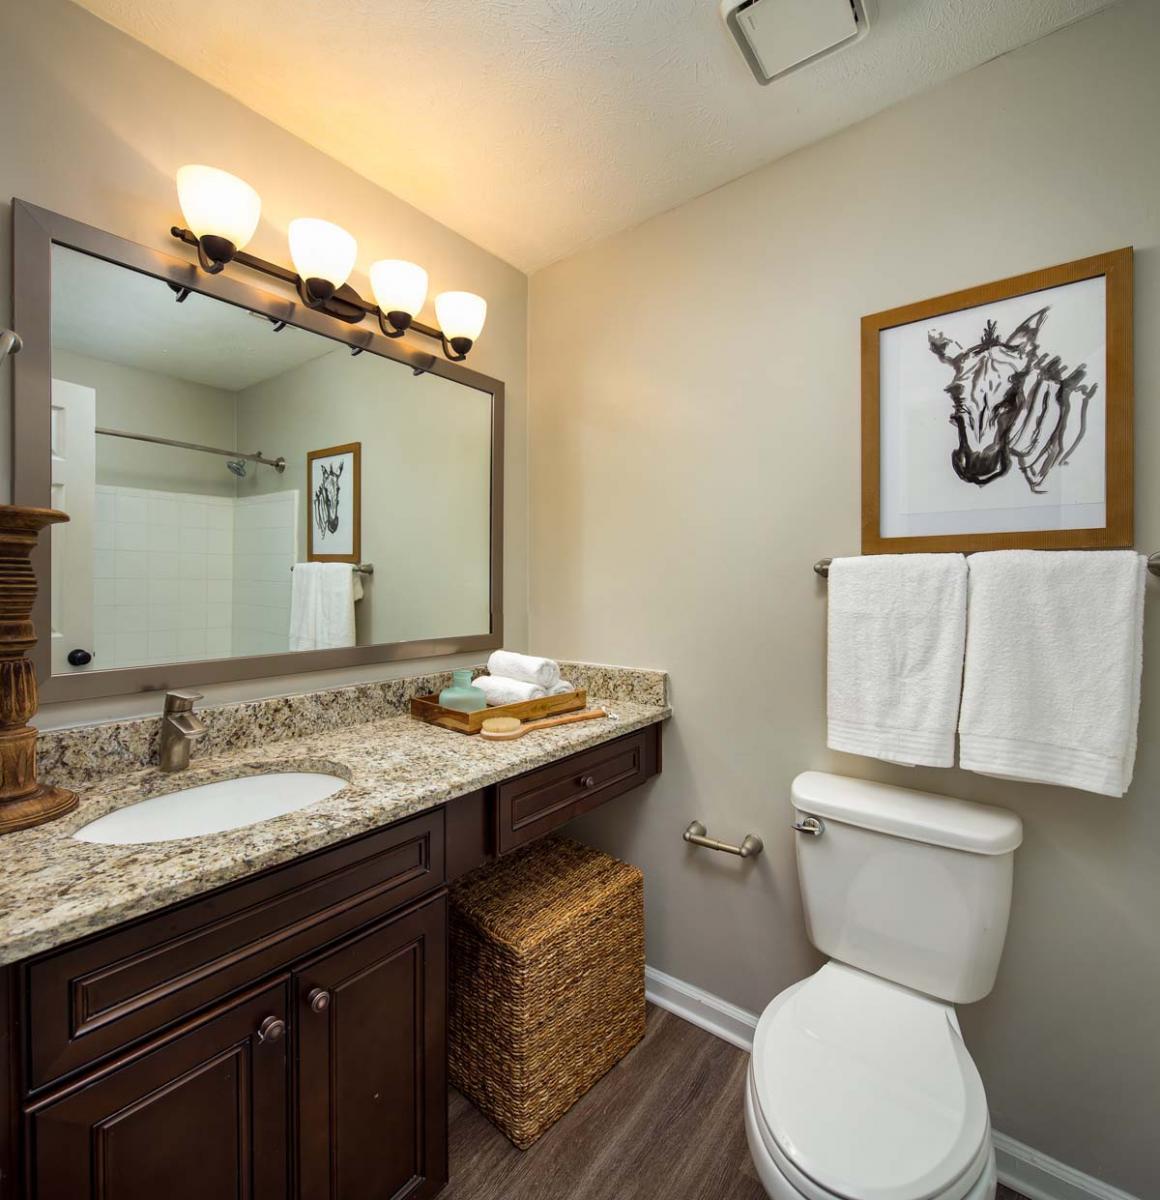 Hampton Woods Apartments: Calibre Woods